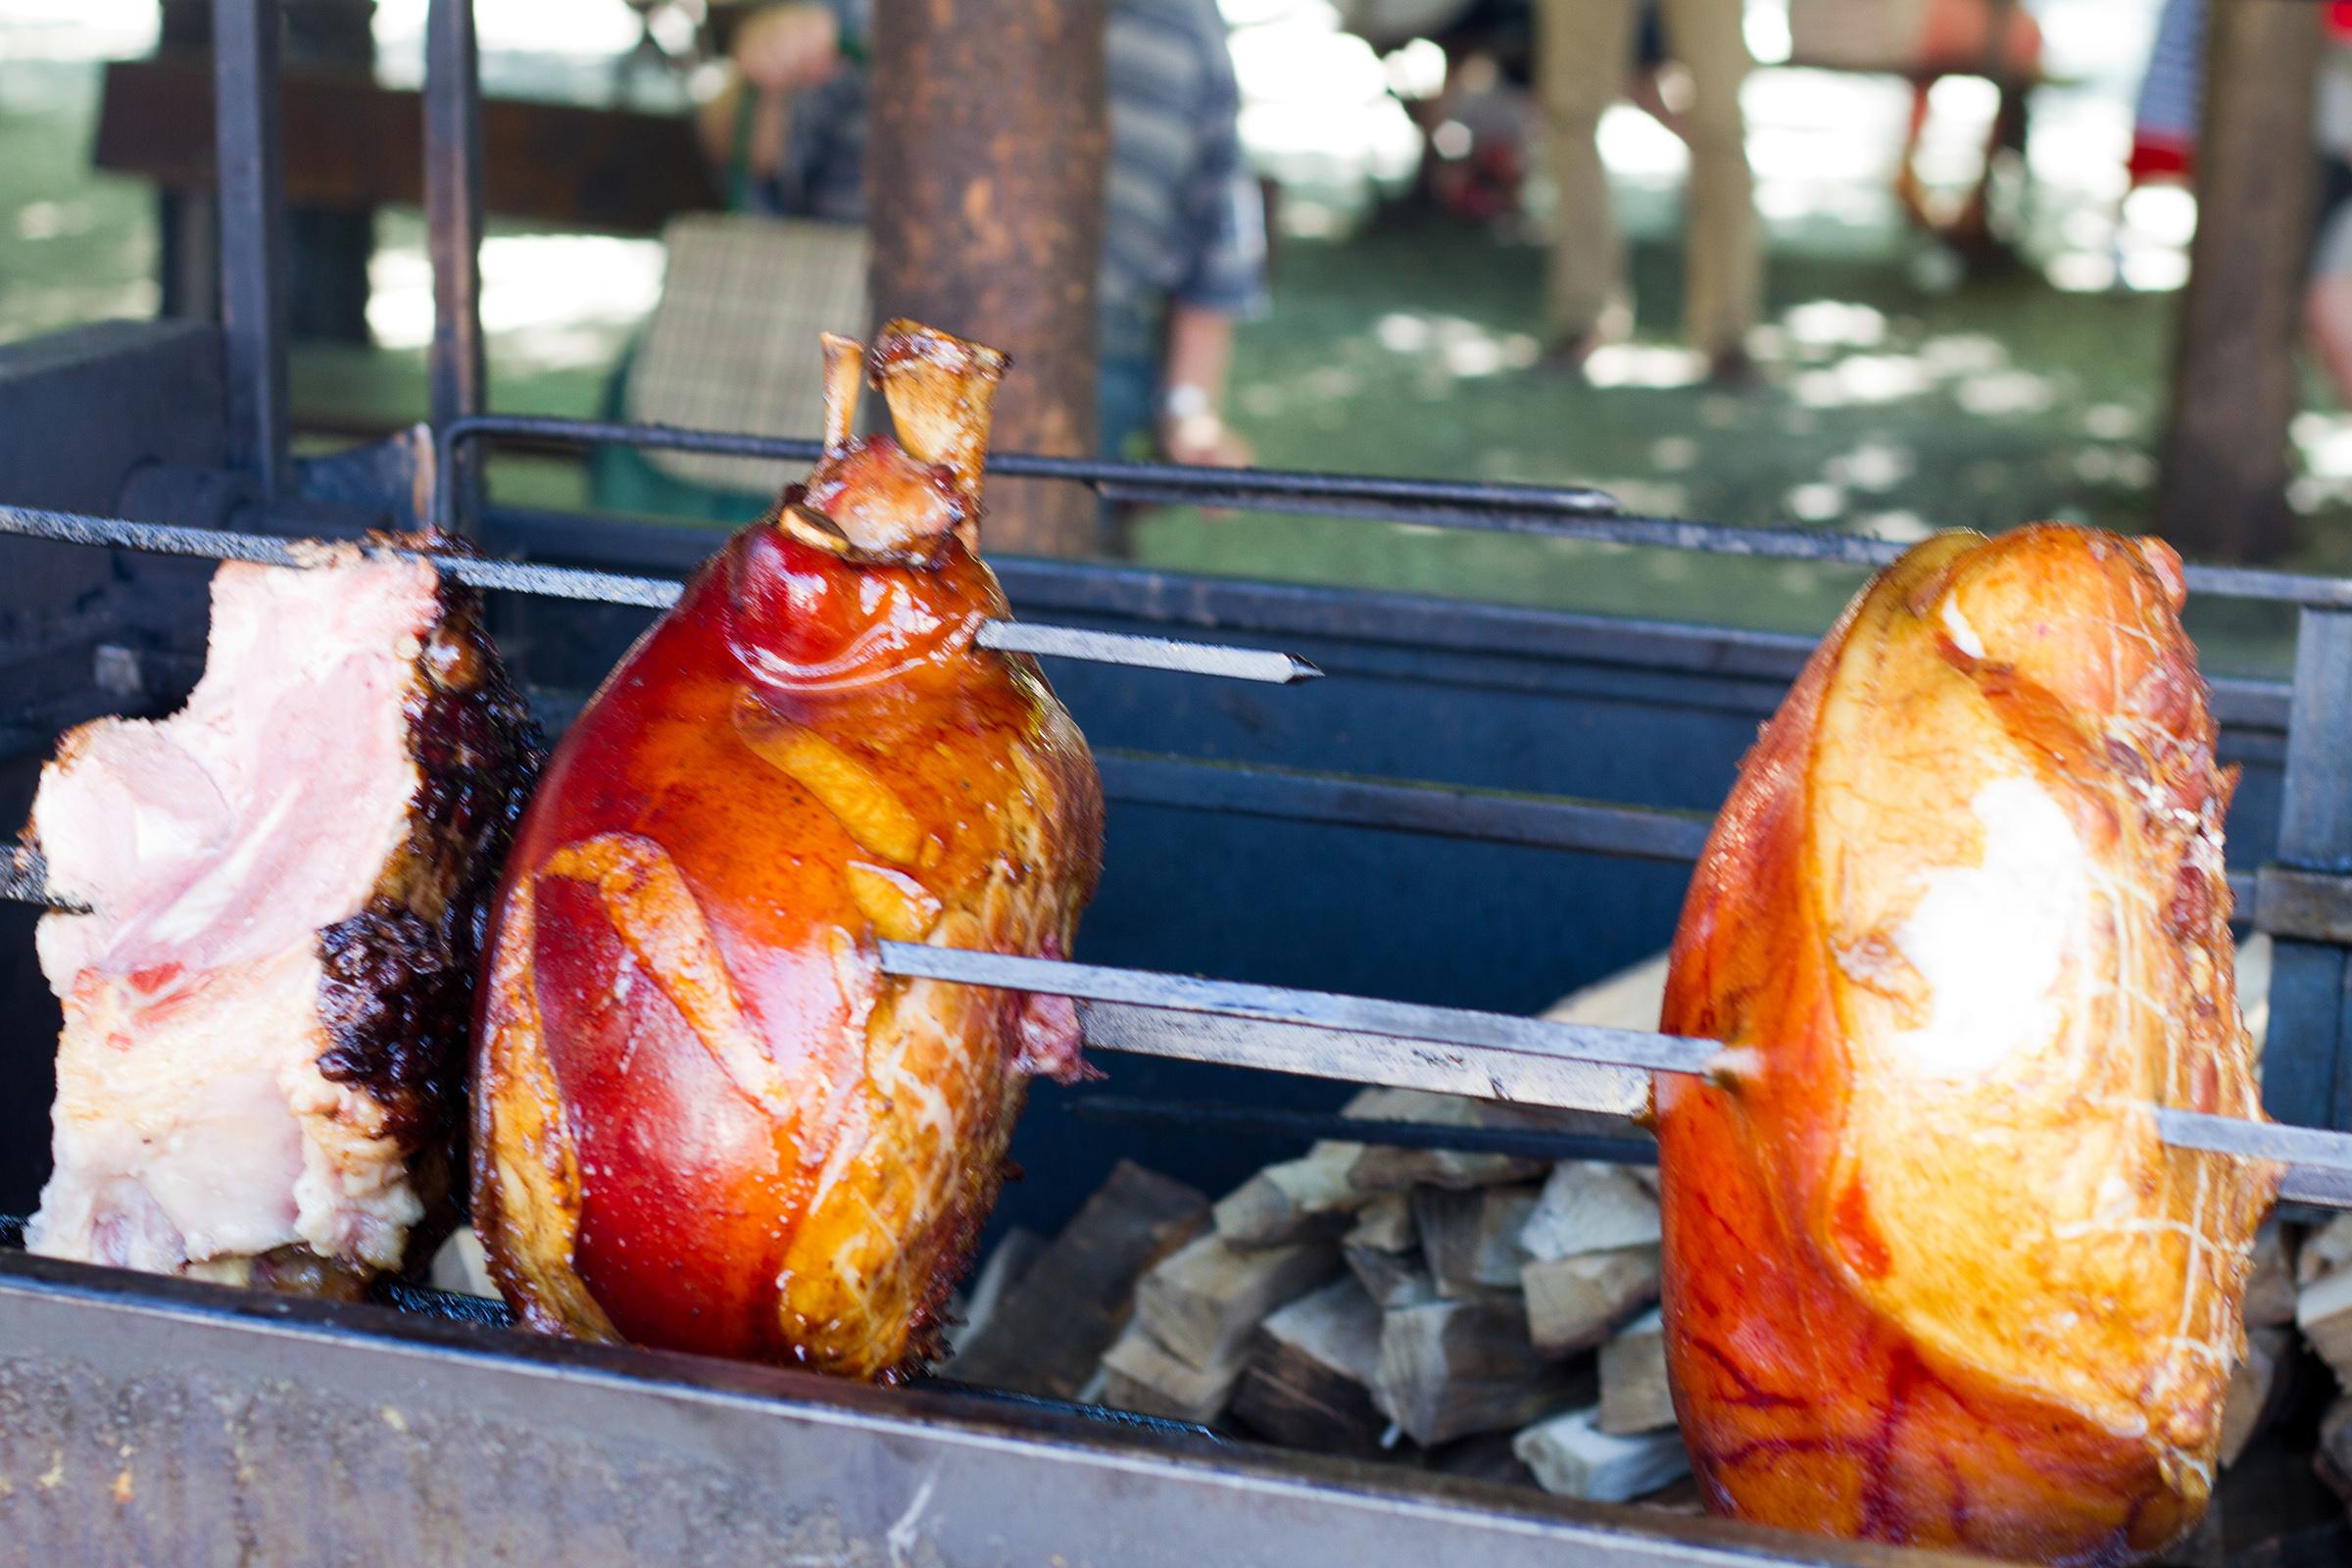 Pork roasting over fire photo